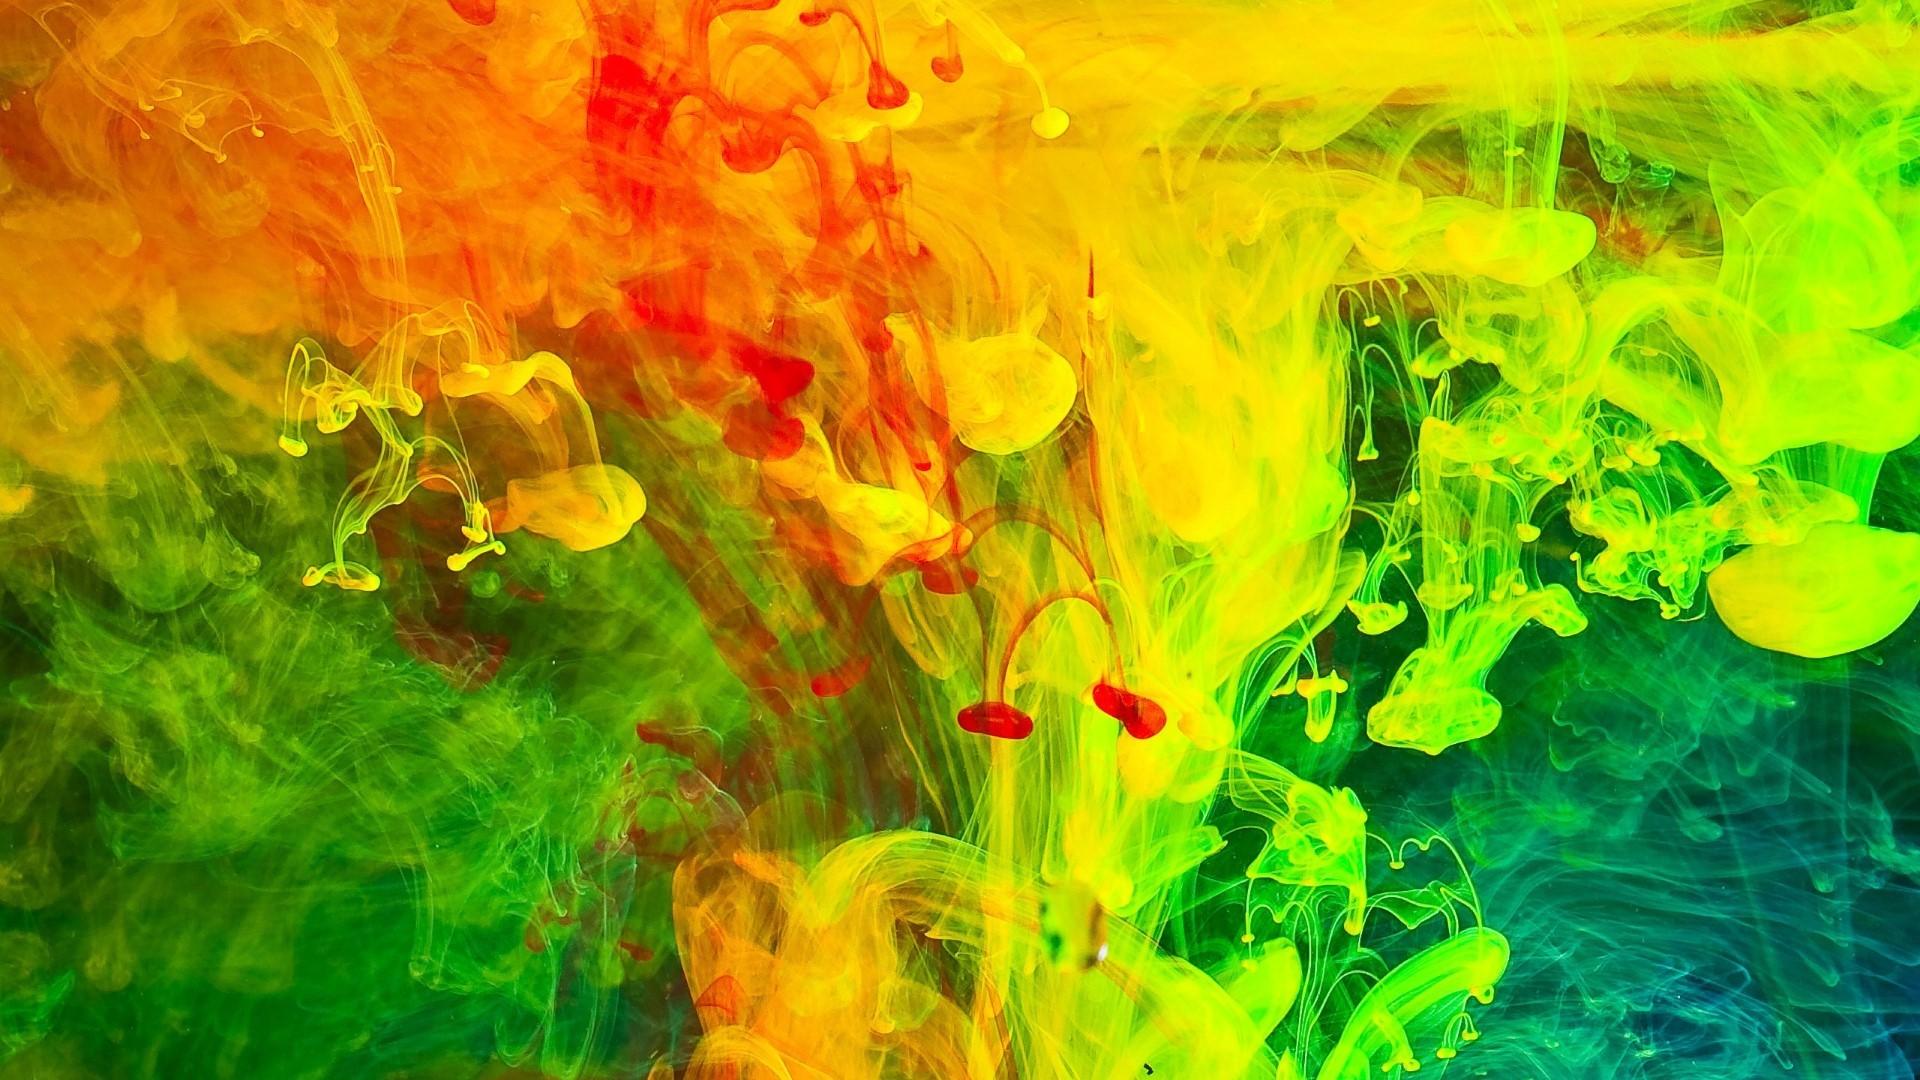 colorful-smoke-art-2560x1440